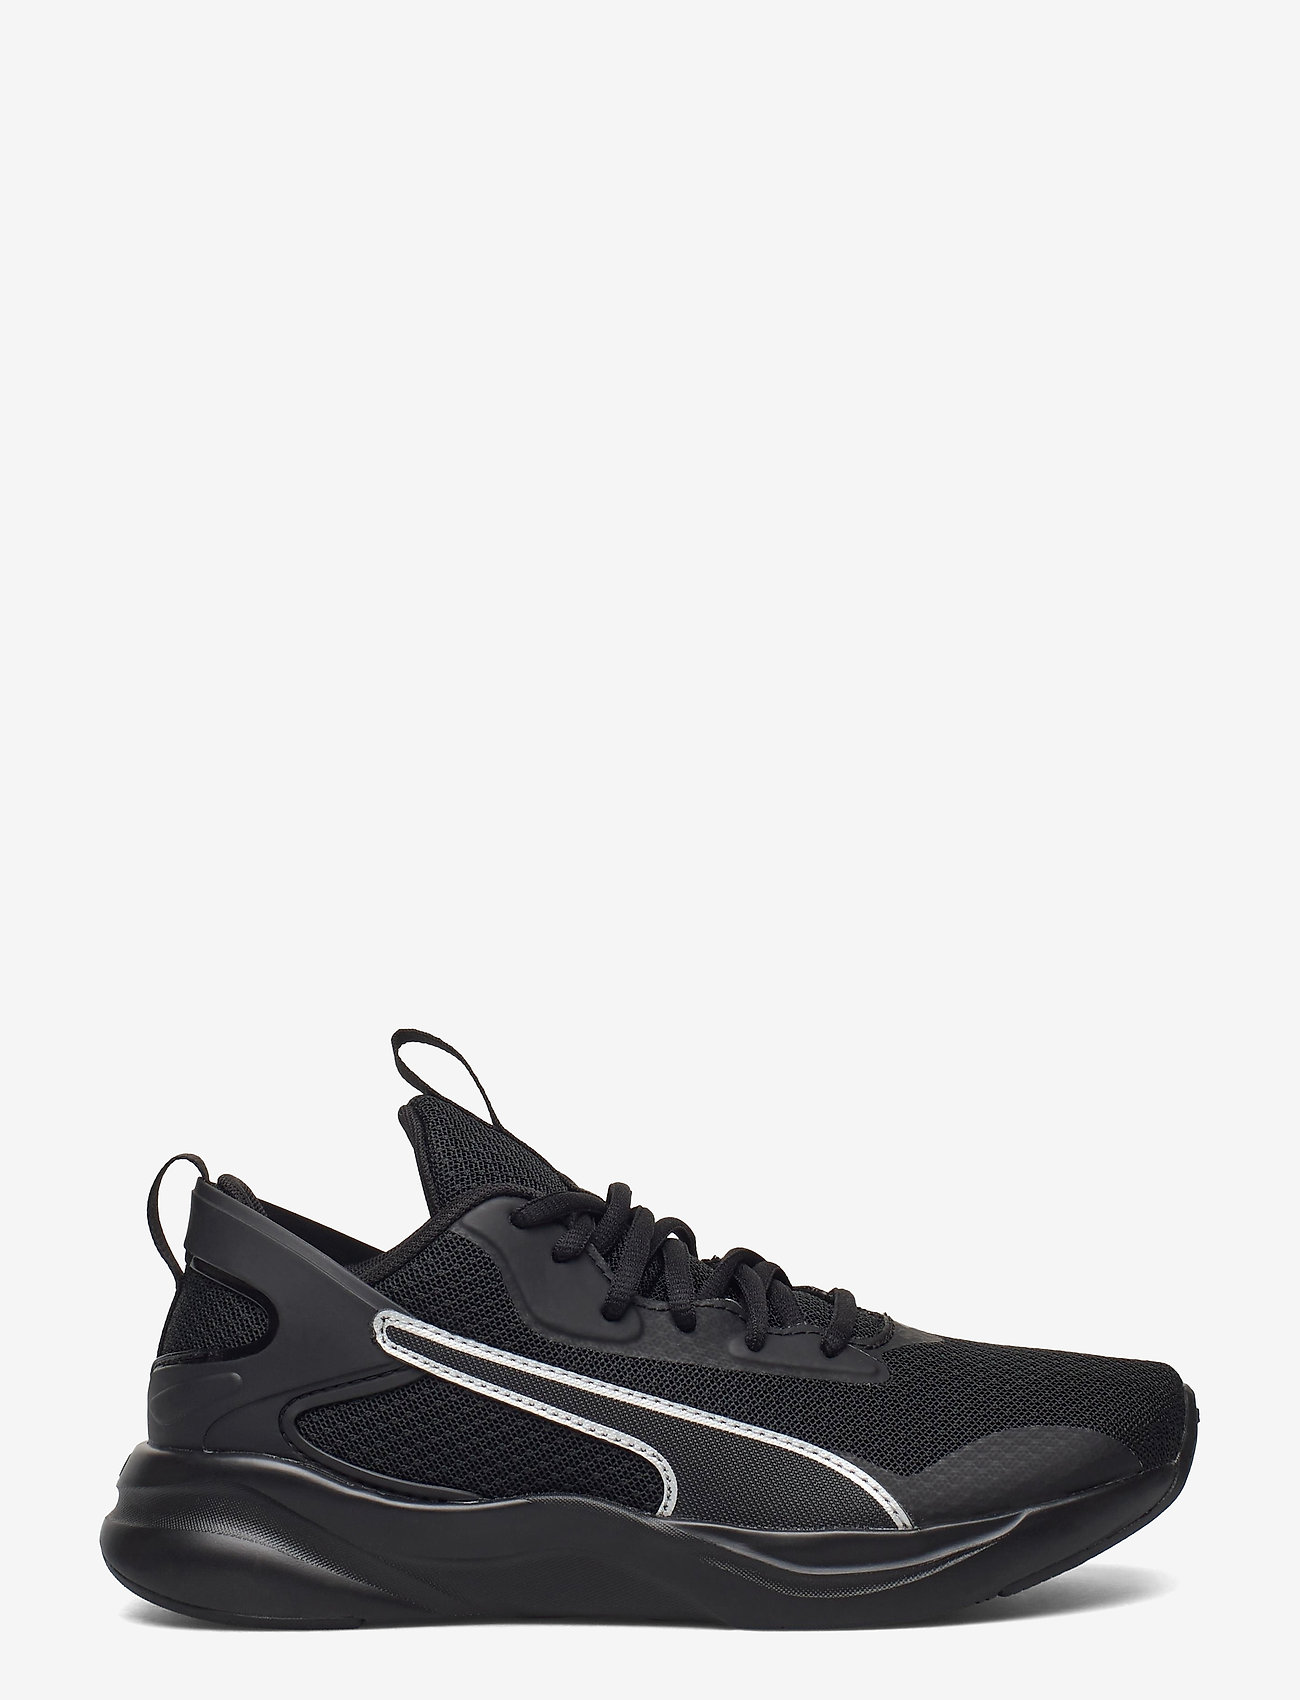 PUMA - SOFTRIDE RIFT Wn's - lage sneakers - puma black-puma black - 1